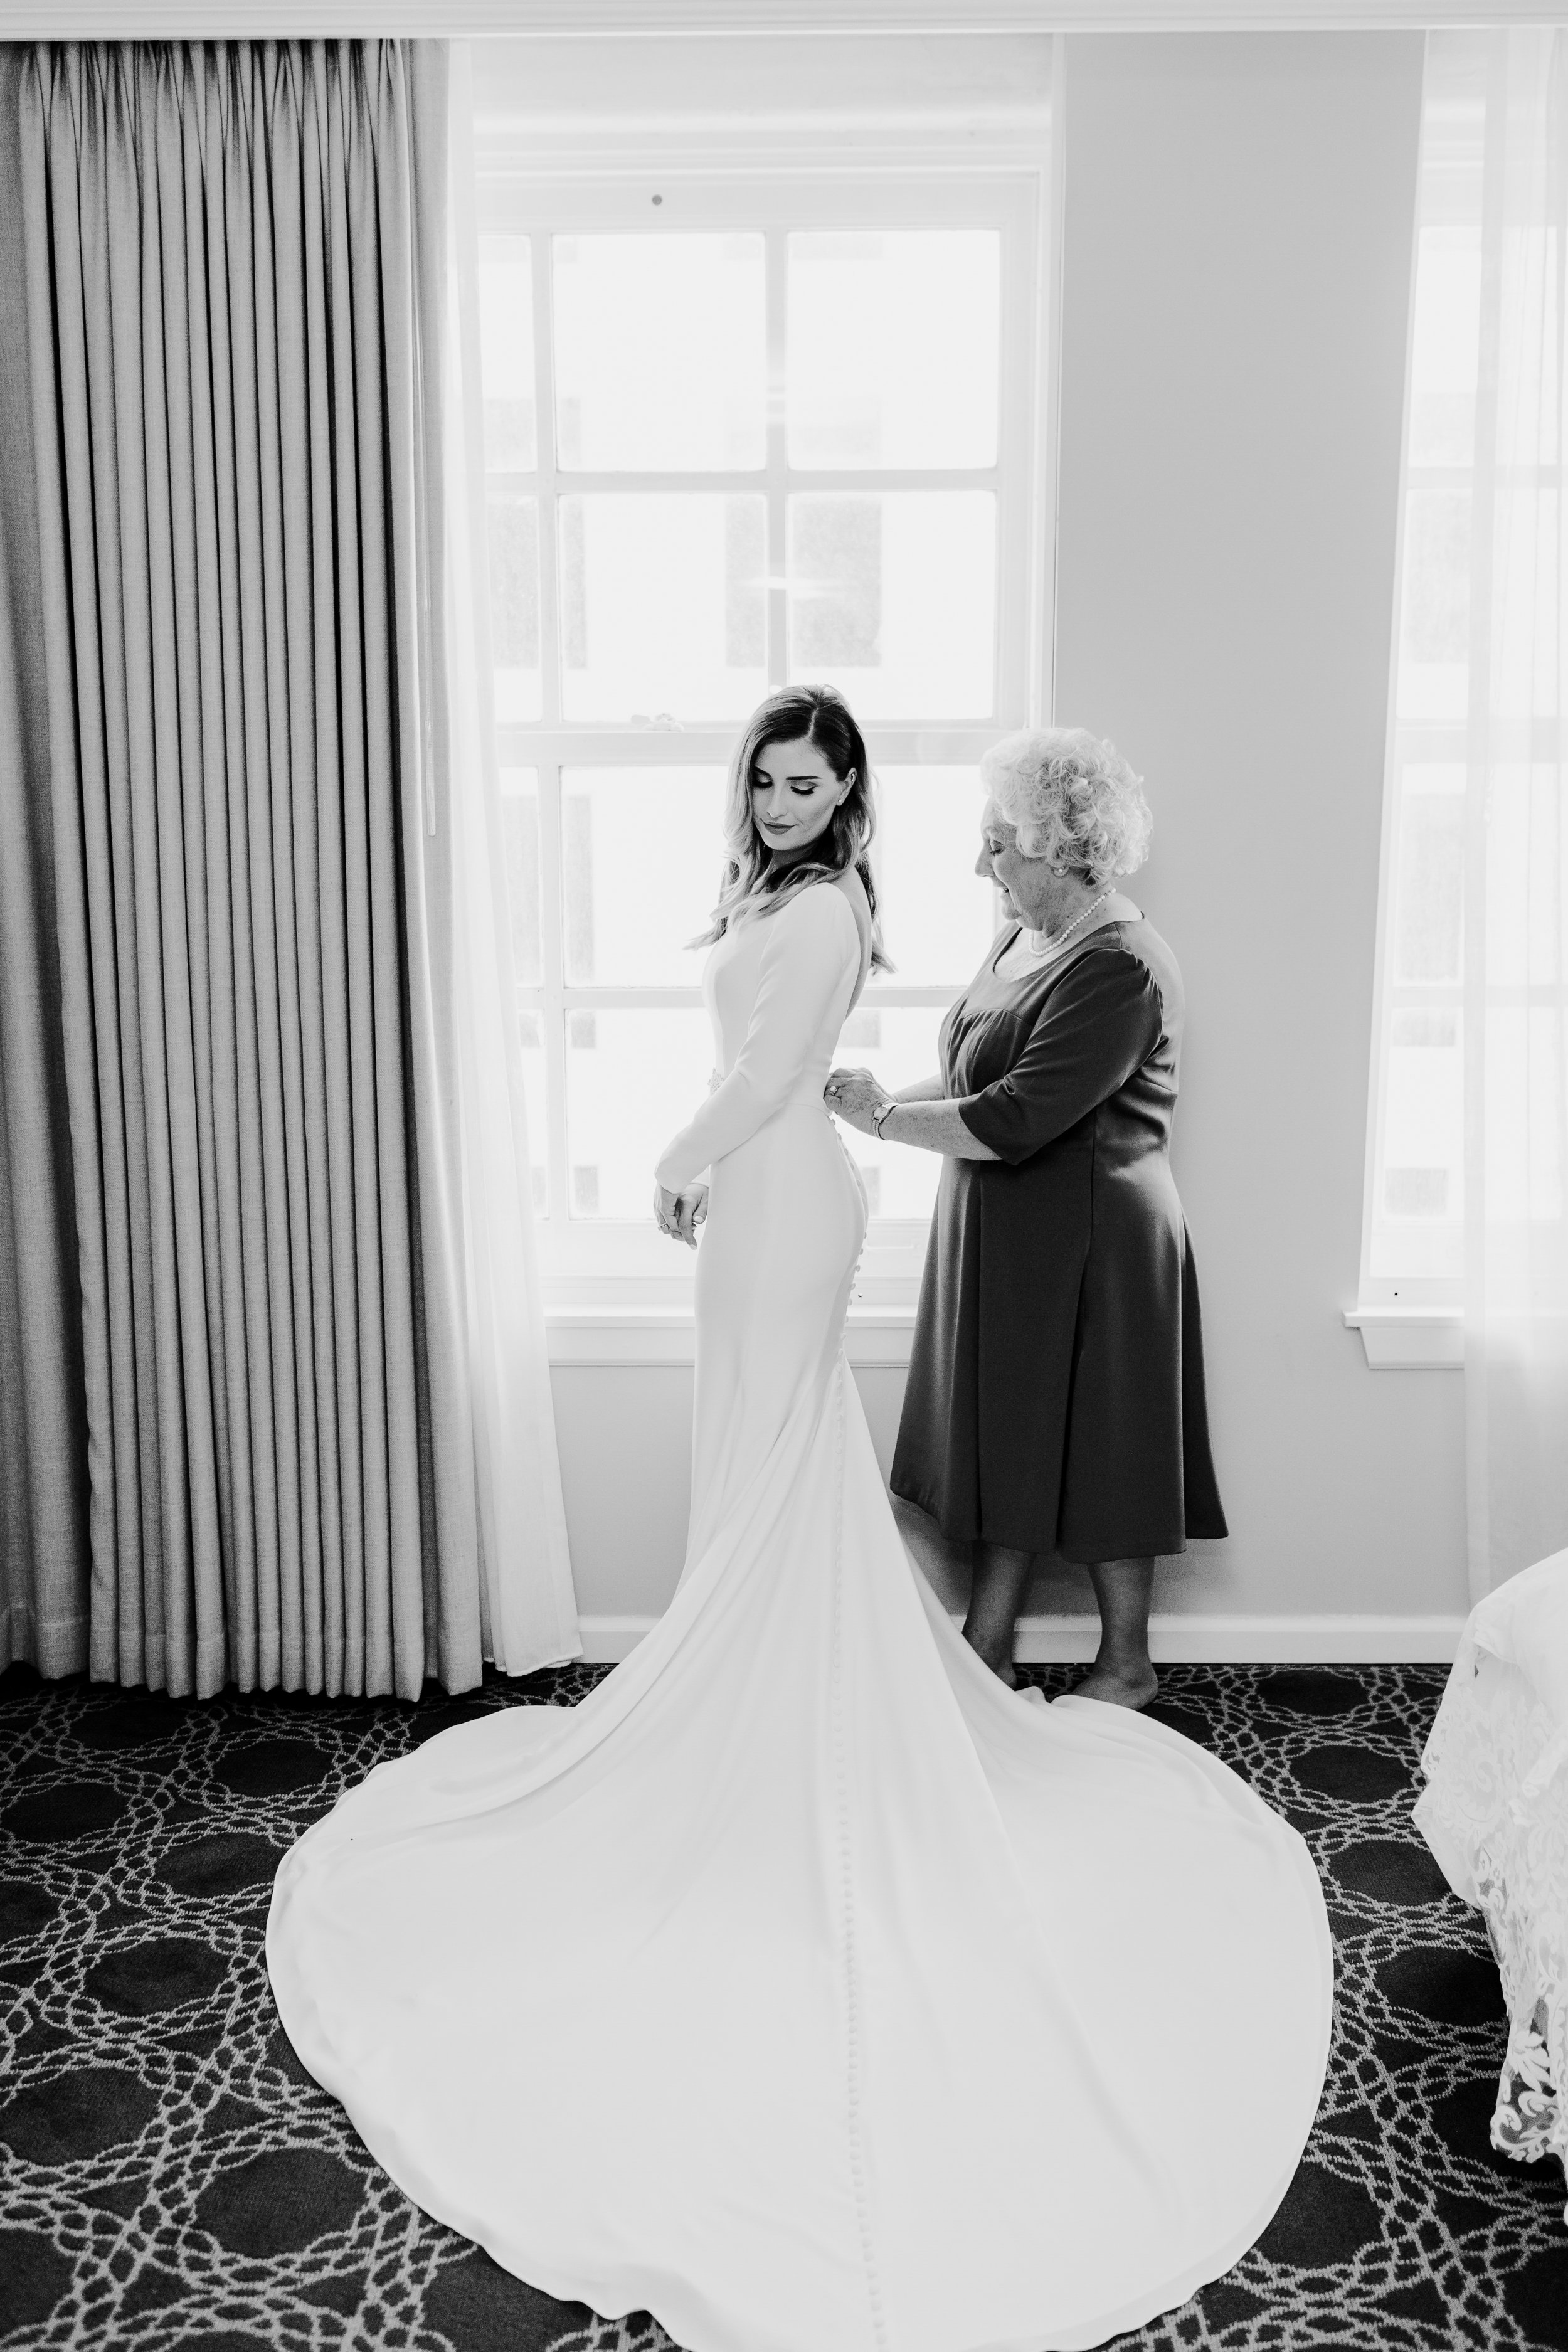 New Orleans Wedding Photographer Bride Getting Ready 8.jpg